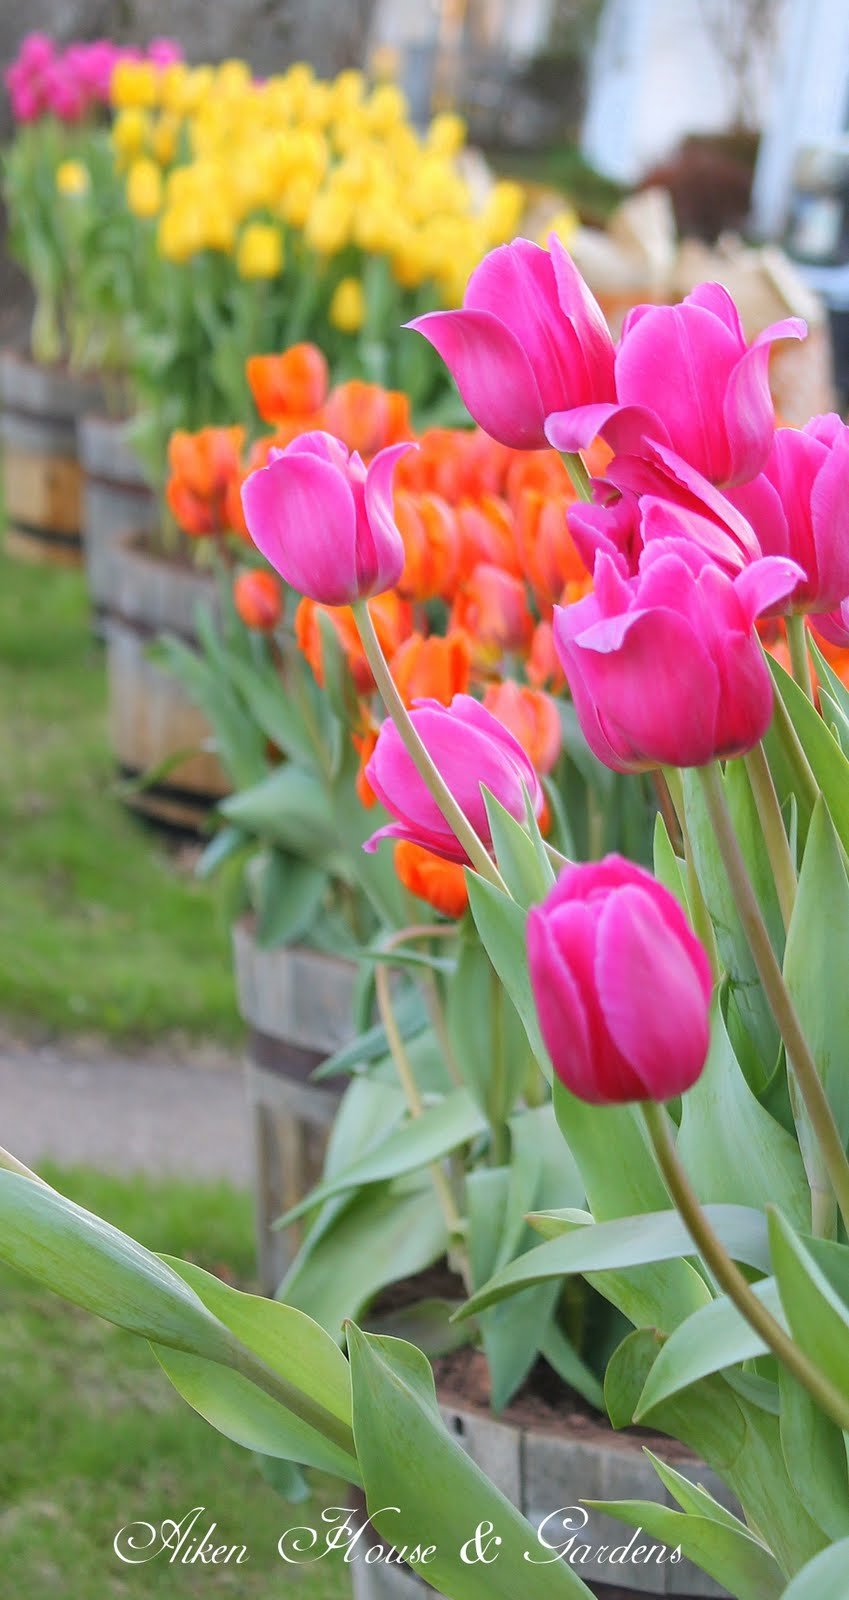 just tulips spring garden - photo #11